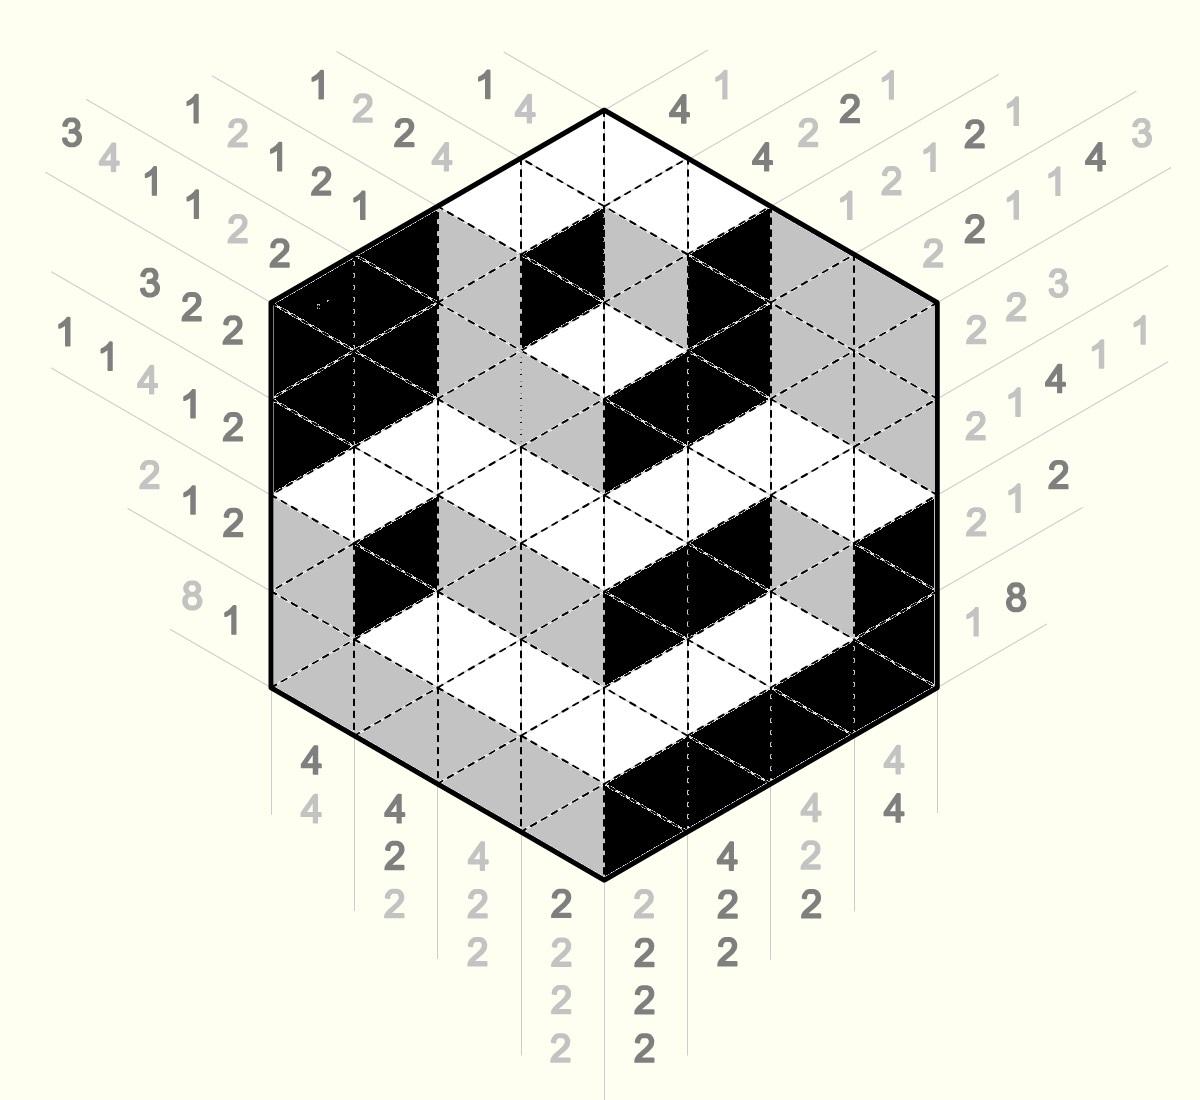 http://www.prise2tete.fr/upload/papiauche-picrossfriZ.jpg